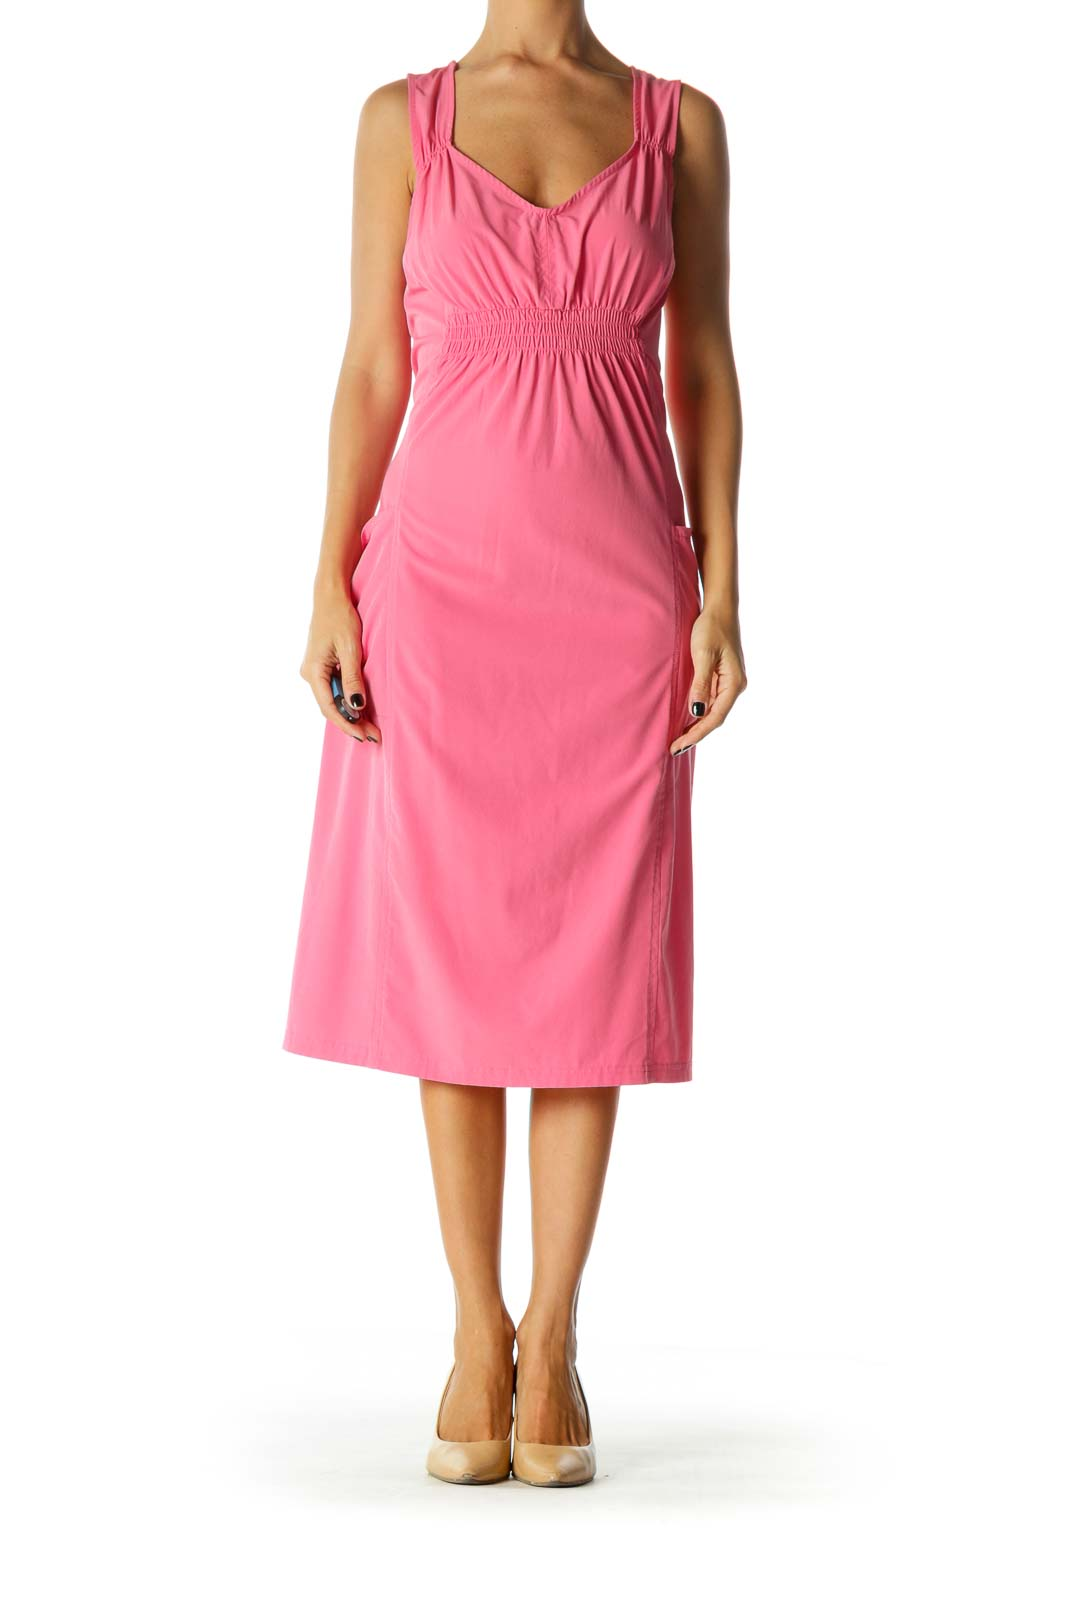 Pink V-Neck Stretch Pocketed Back Cut Out Active Dress